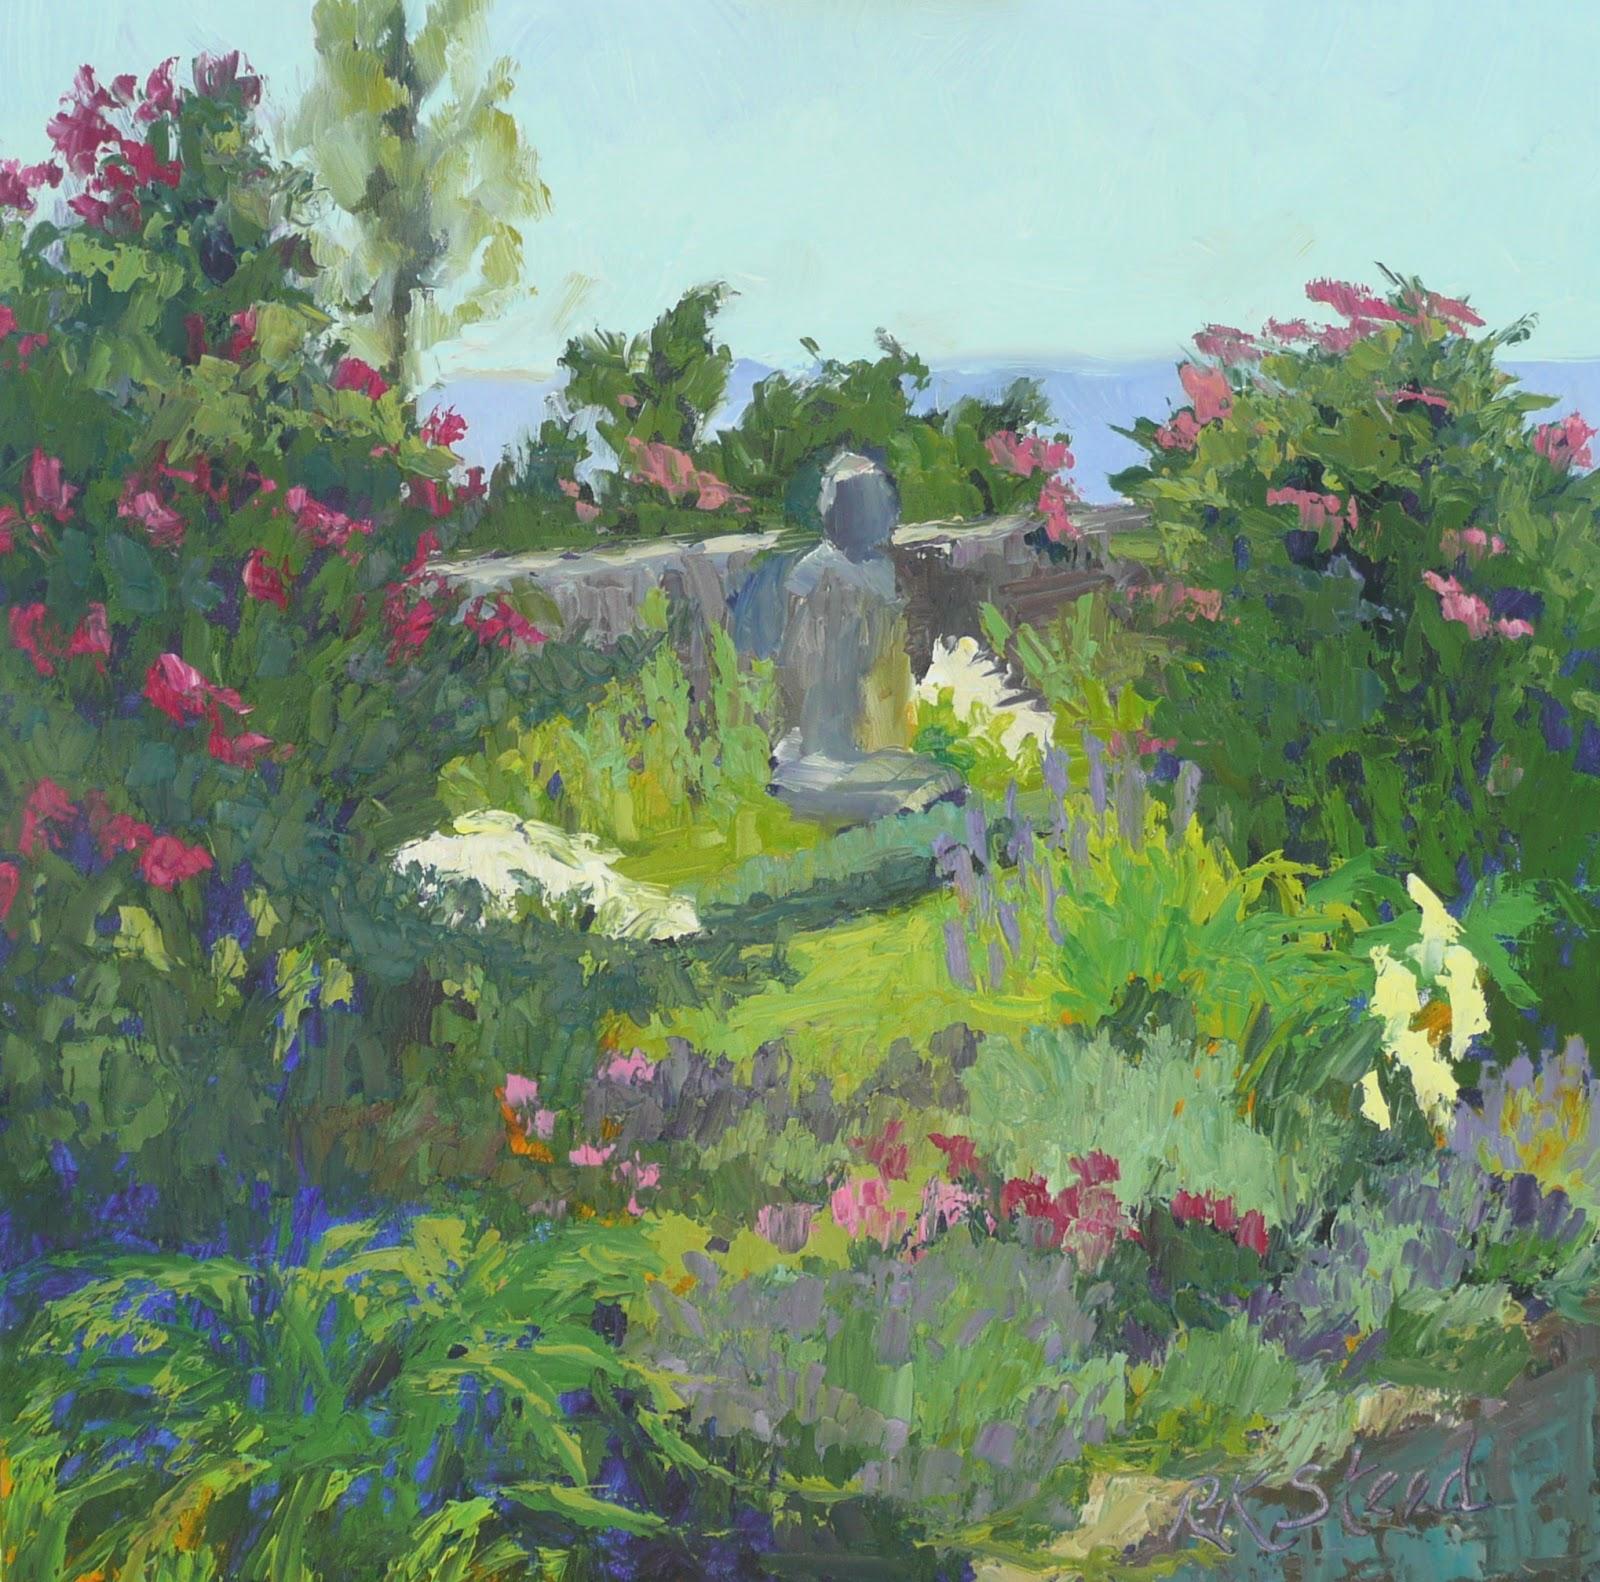 Beau Buddha Garden By The Sea, Plein Air Harkness Park